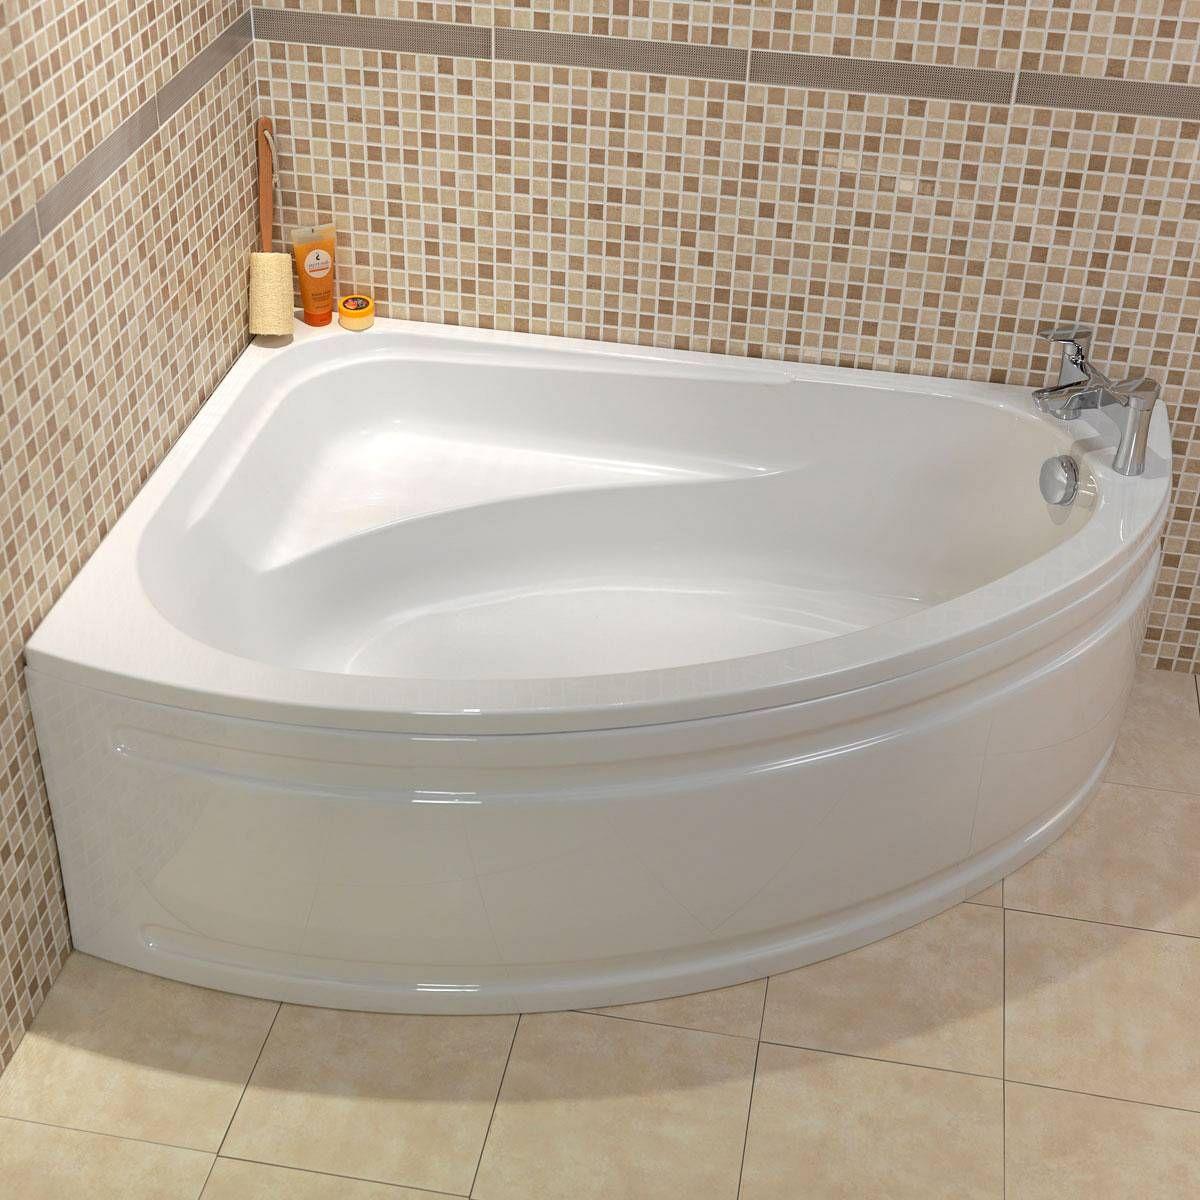 Camden Corner Bath LH 1500mm Victoria Plumb | House refurb ...